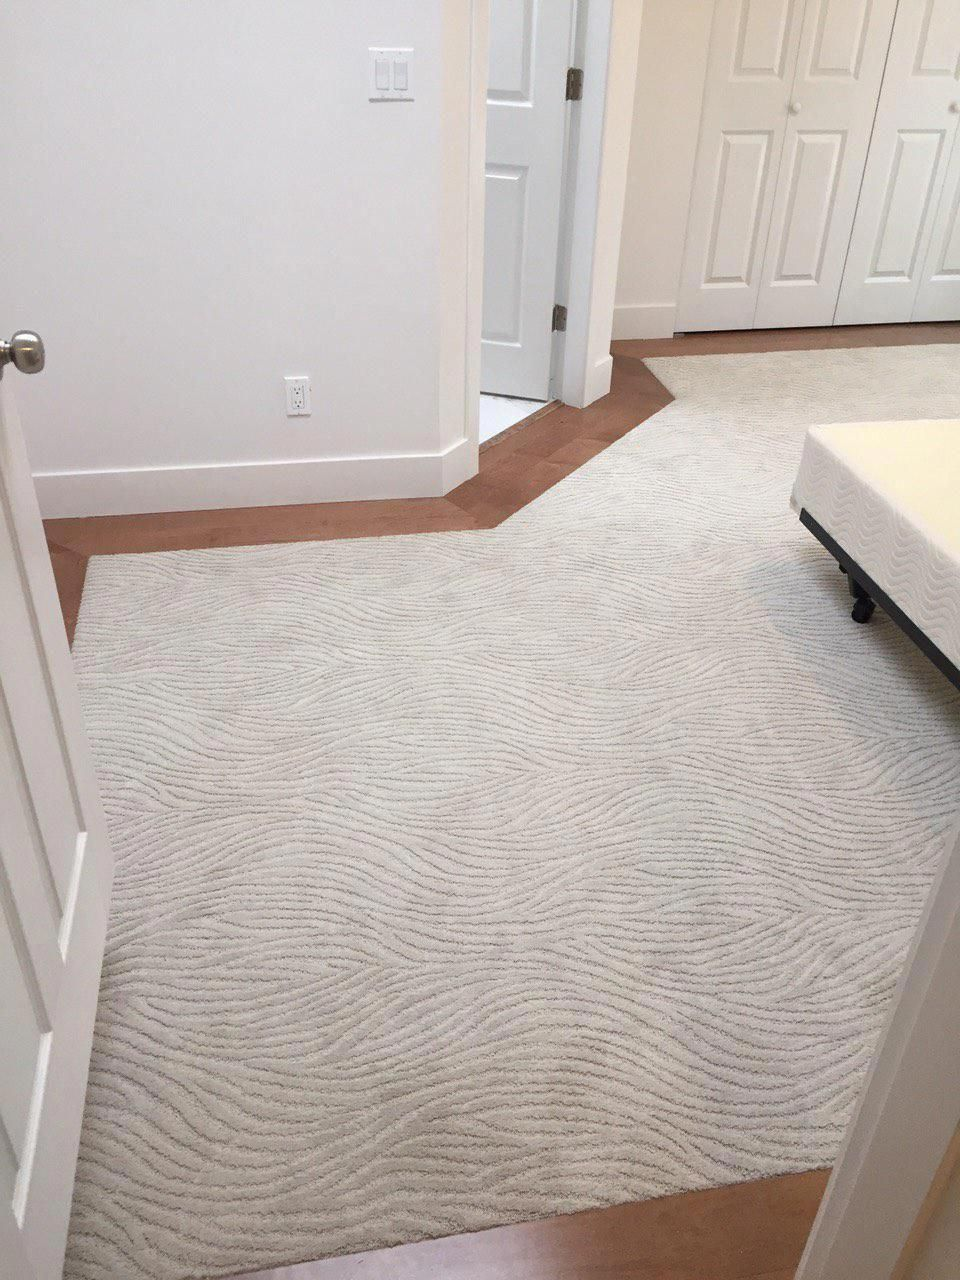 Mohawk Dramatic Flair In Hushed Beige Carpet Maple Hardwood Floor Border Master Bedroom Renovation Bedroom Flooring Carpet Living Room Carpet Beige Carpet